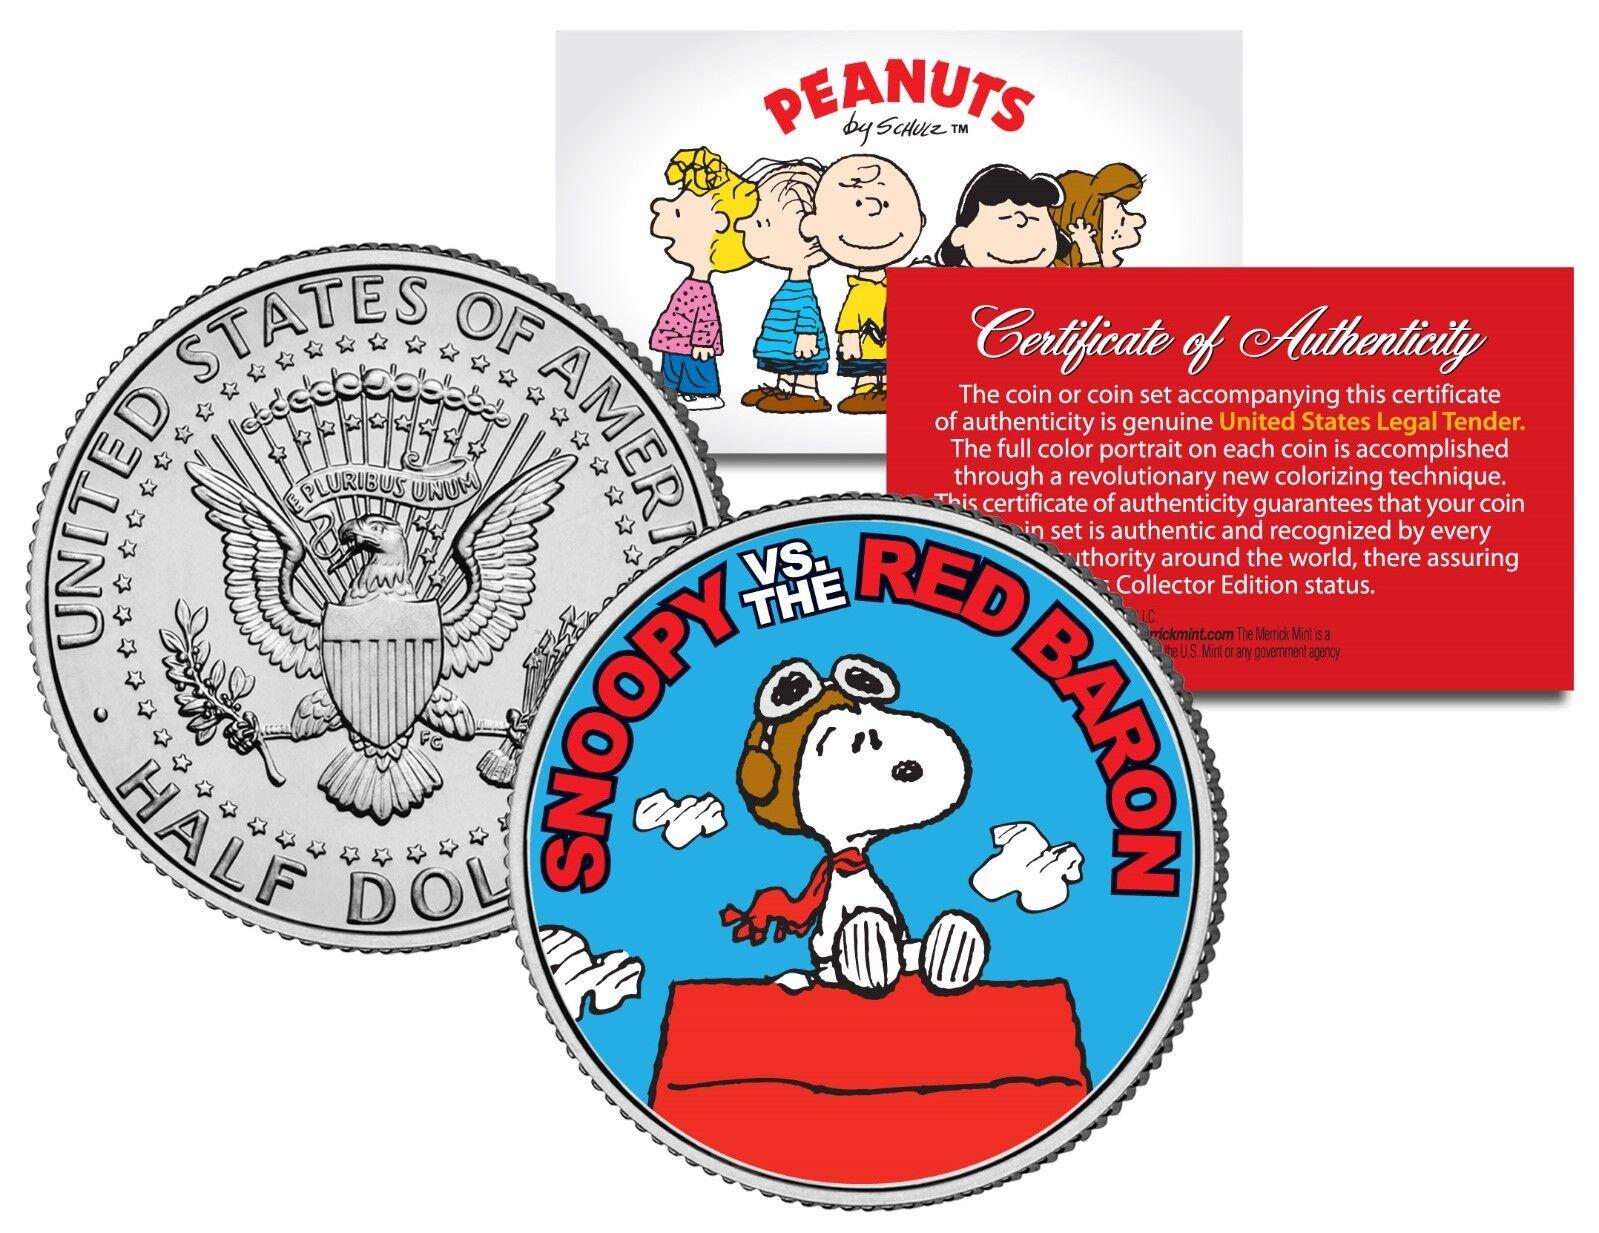 Coin with 4x6 Display RED BARON JFK Kennedy Half Dollar U.S Peanuts SNOOPY vs